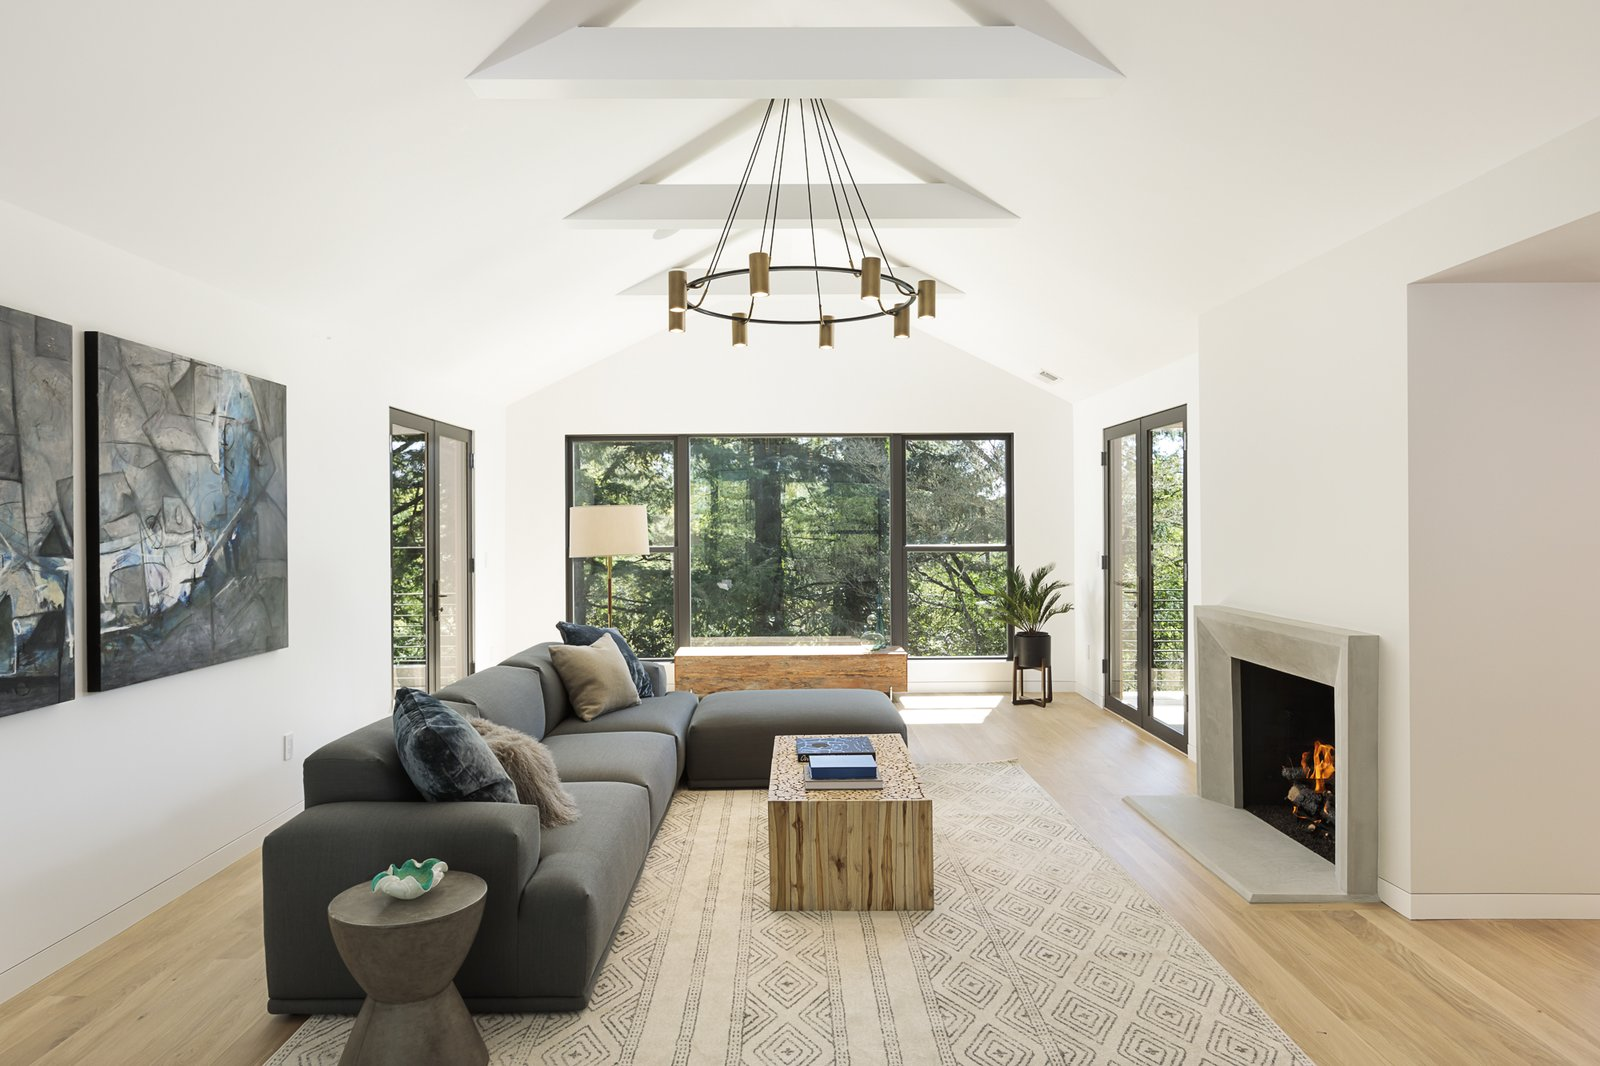 Living Room, Gas Burning Fireplace, Ceiling Lighting, and Light Hardwood Floor  Burton House